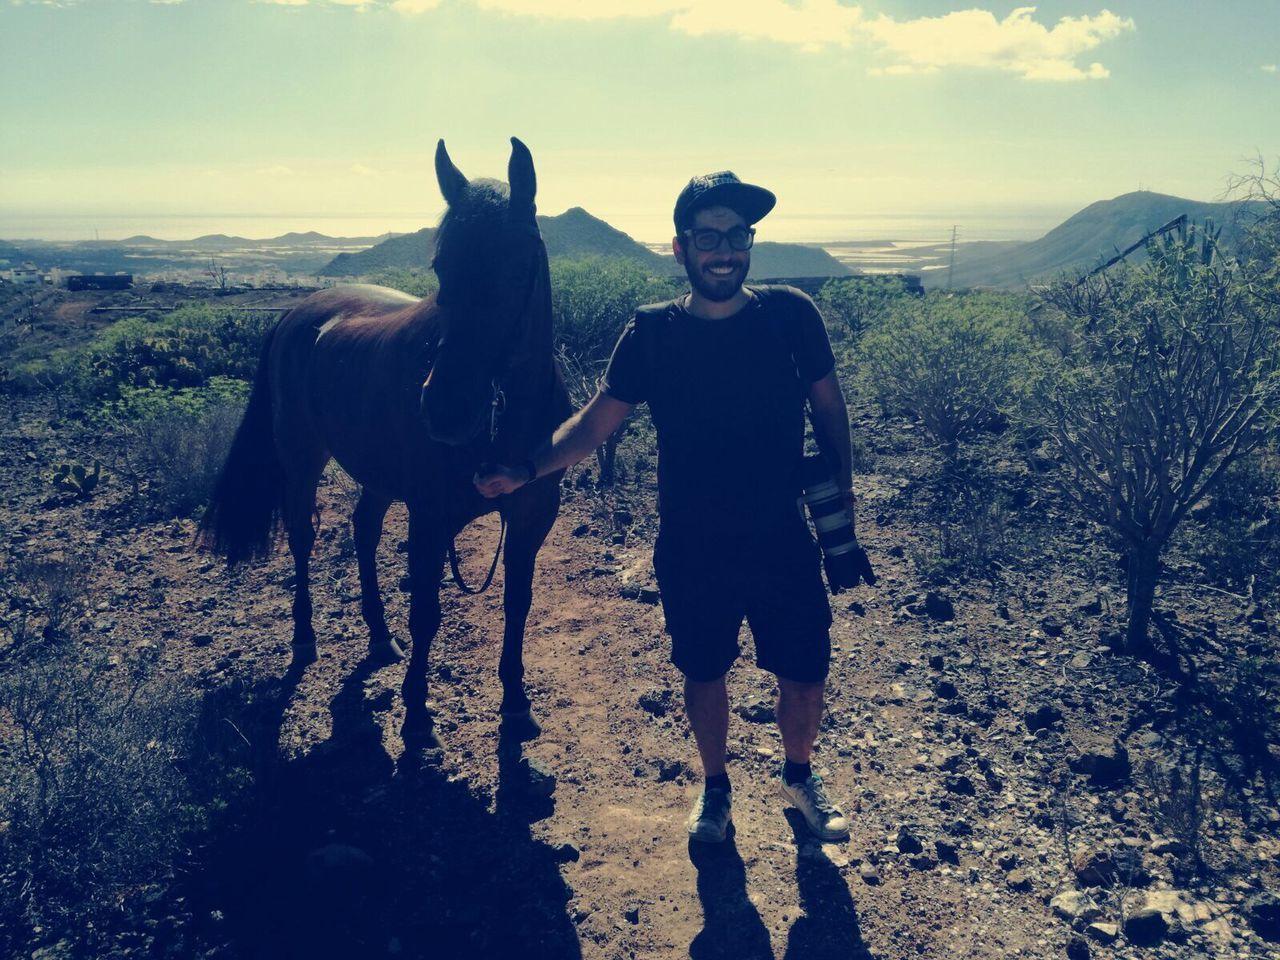 Arre caballito ❤️🐴 Horse Happiness Mare Tenerife Tenerife Island Canarias Photography Canary Islands Islas Canarias Caballos Teneriffa Photographer